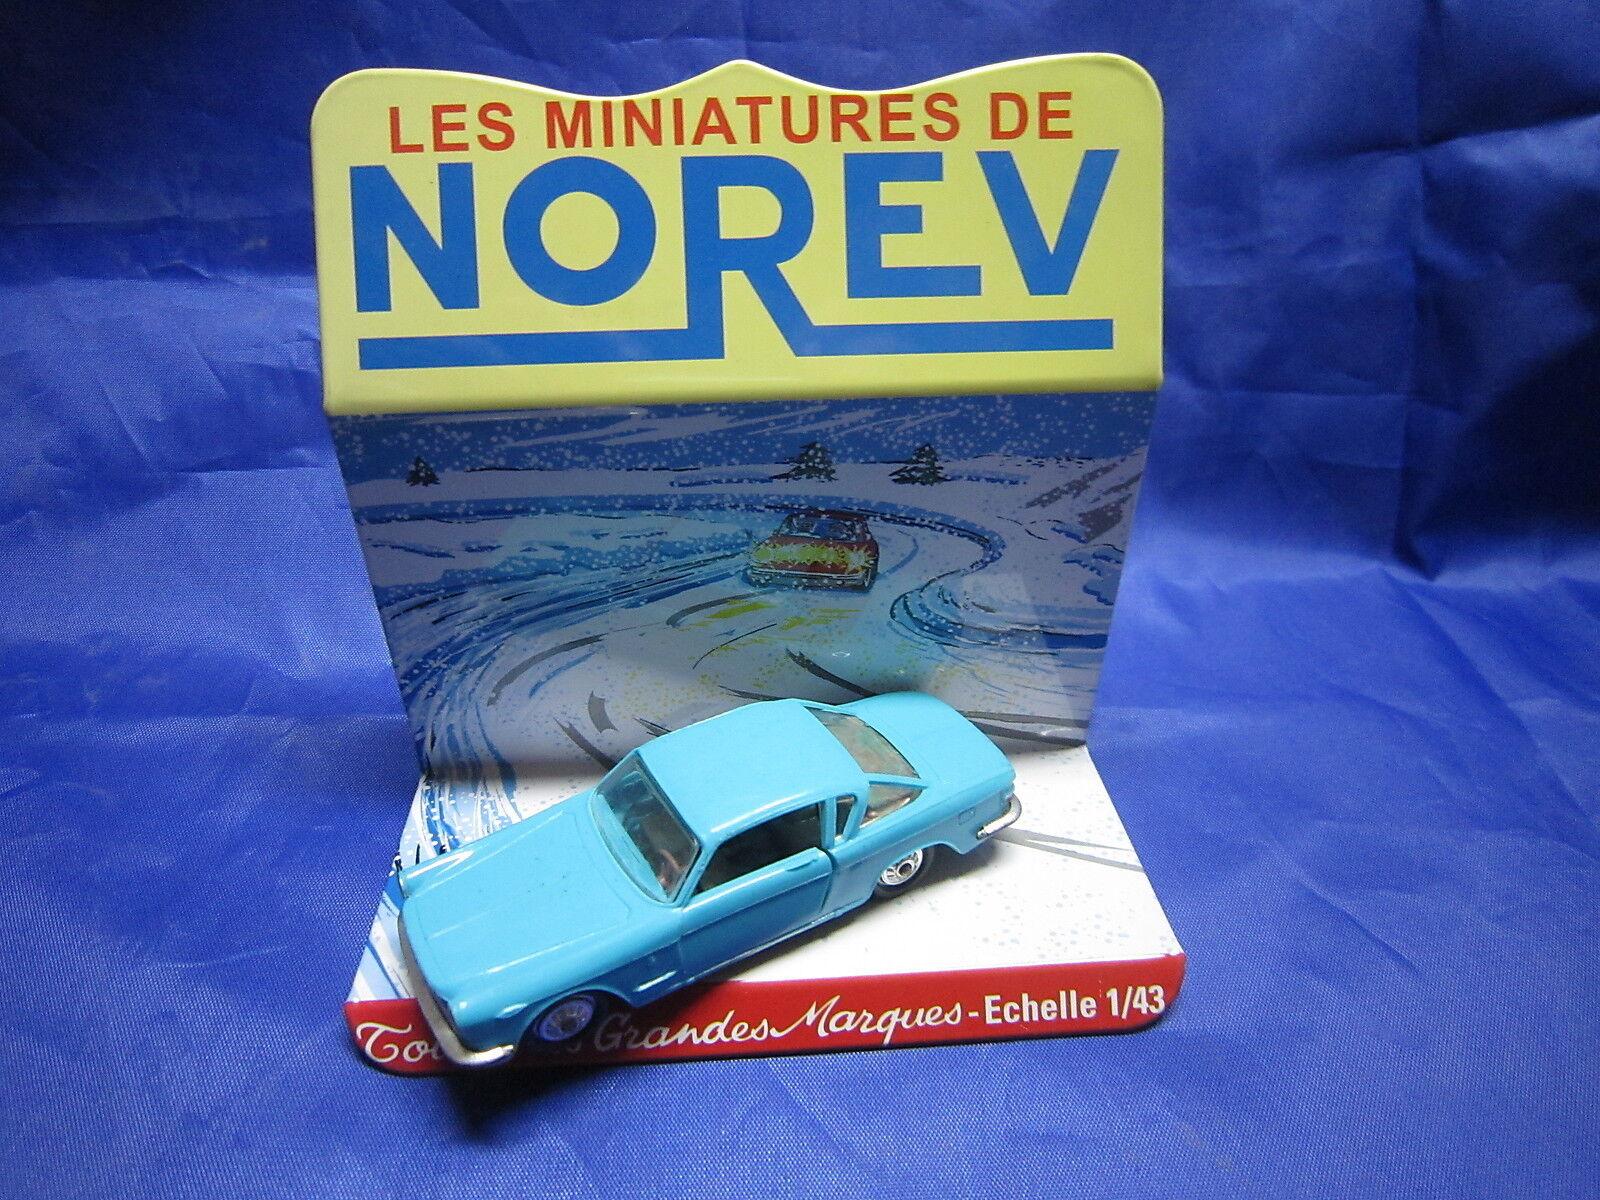 DV6280 NOREV FIAT COUPE 2300 PLASTIQUE blueE Ref 80 1 43 TBE